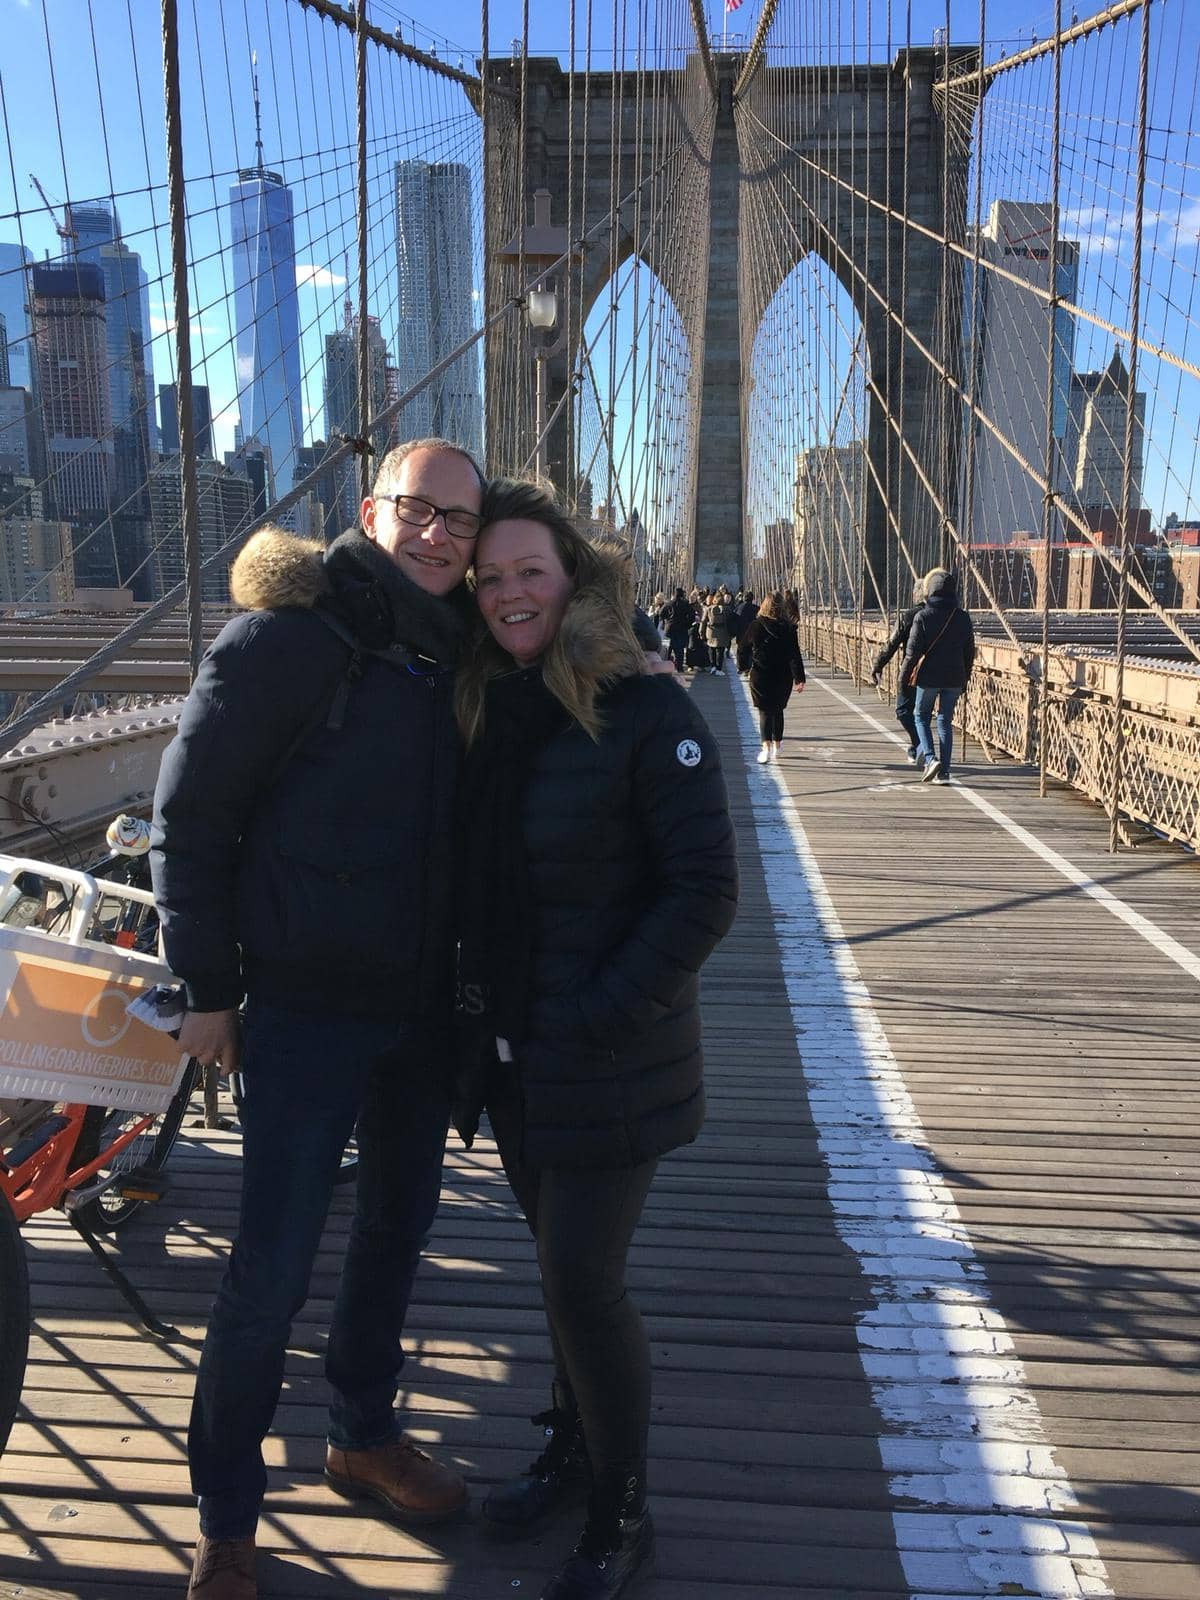 Voita matka New Yorkiin - Brooklyn Bridge